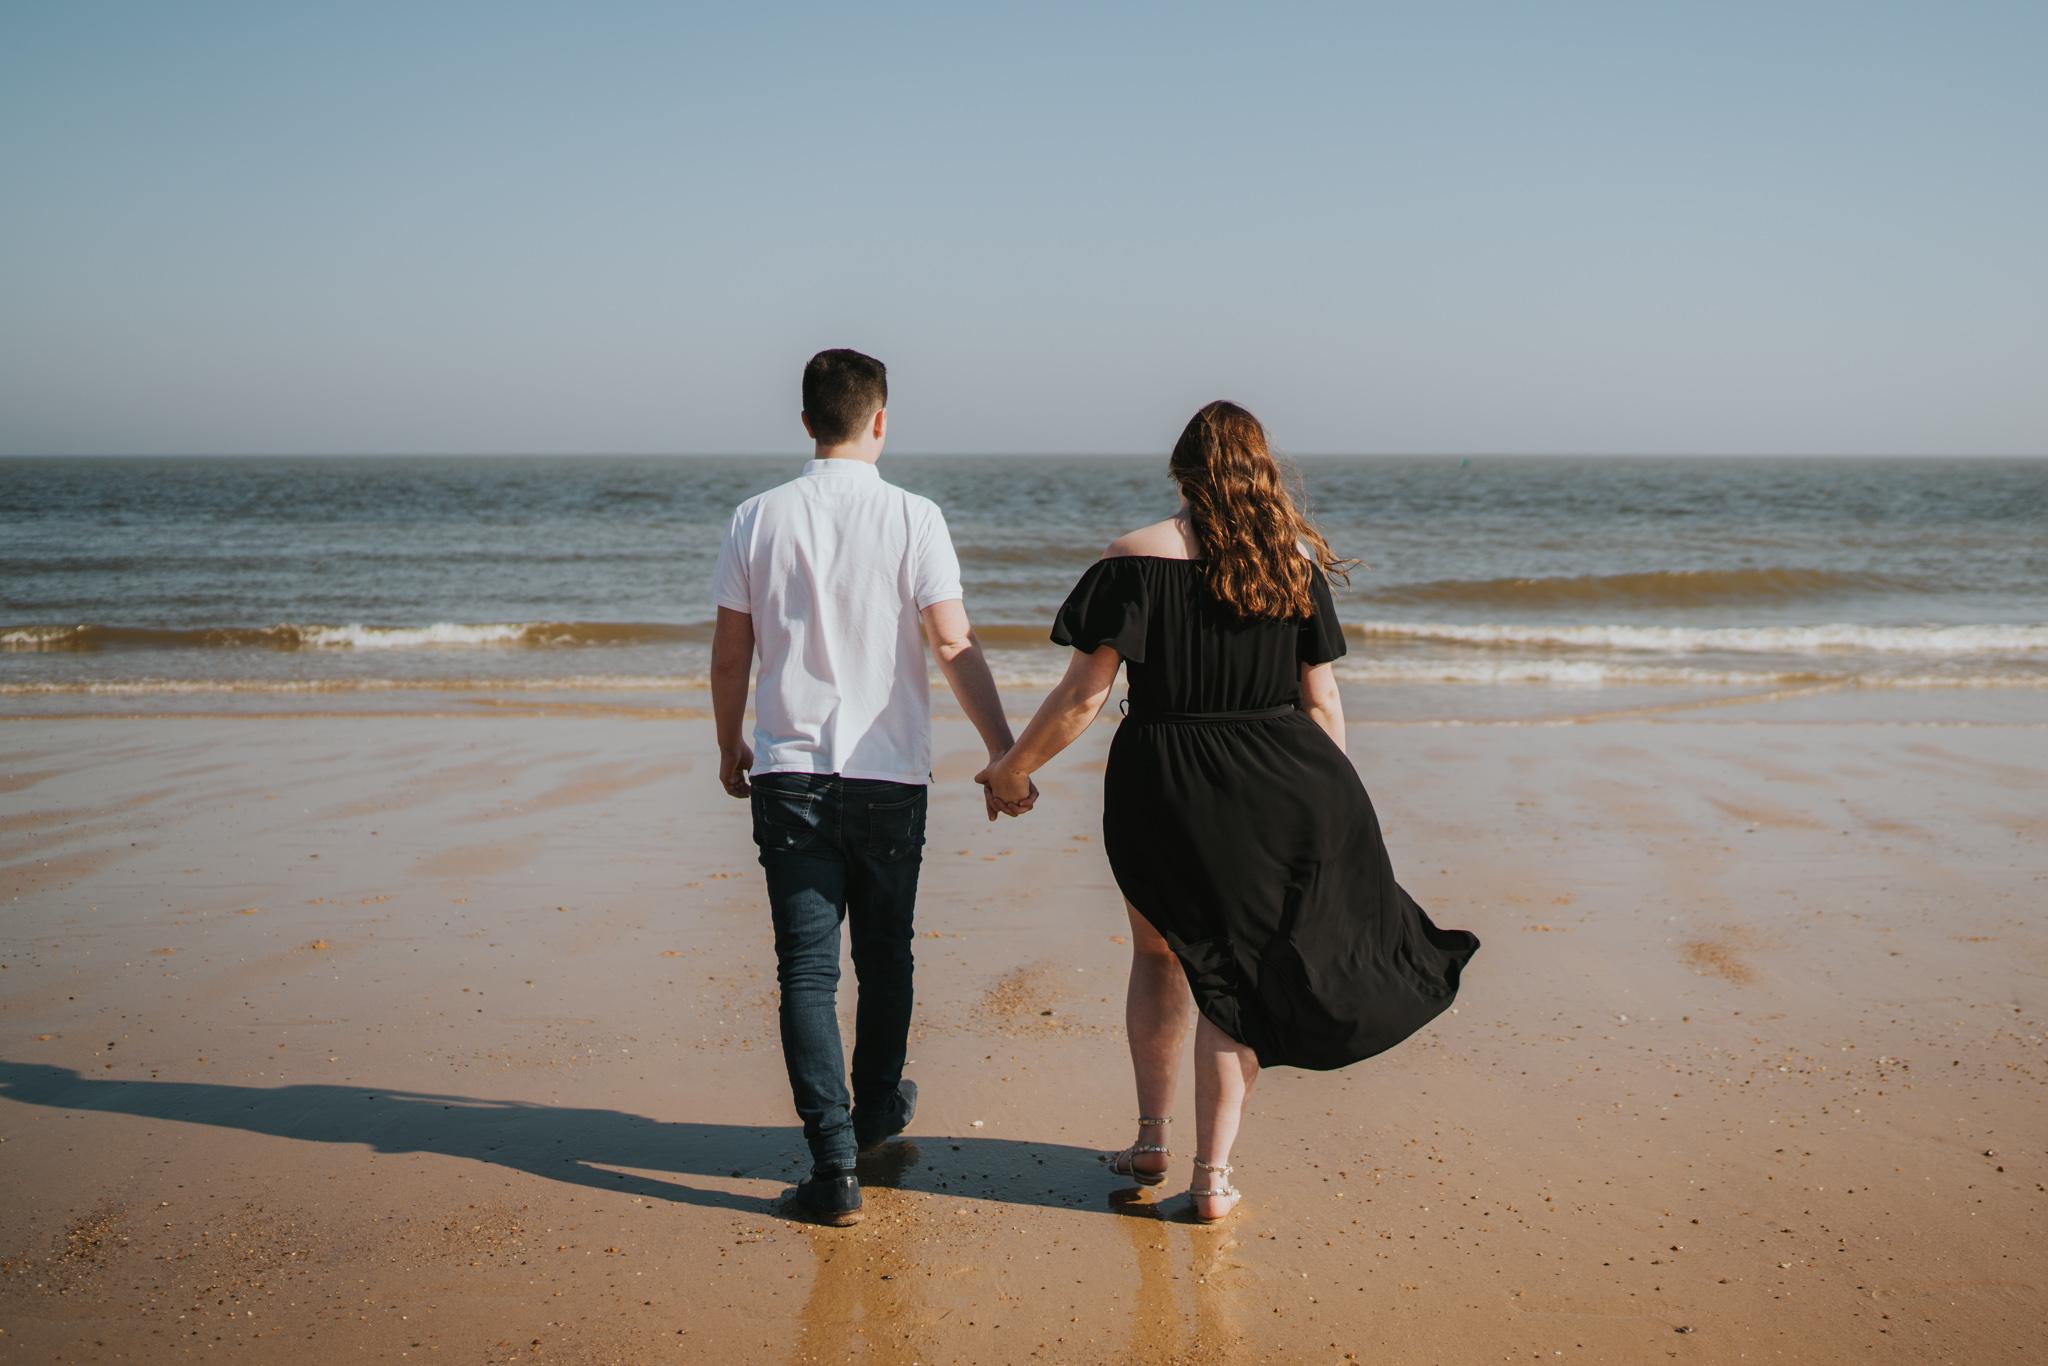 steph-peter-relaxed-frinton-beach-engagement-session-grace-elizabeth-colchester-essex-alternative-wedding-lifestyle-photographer-essex-suffolk-norfolk-devon (16 of 16).jpg